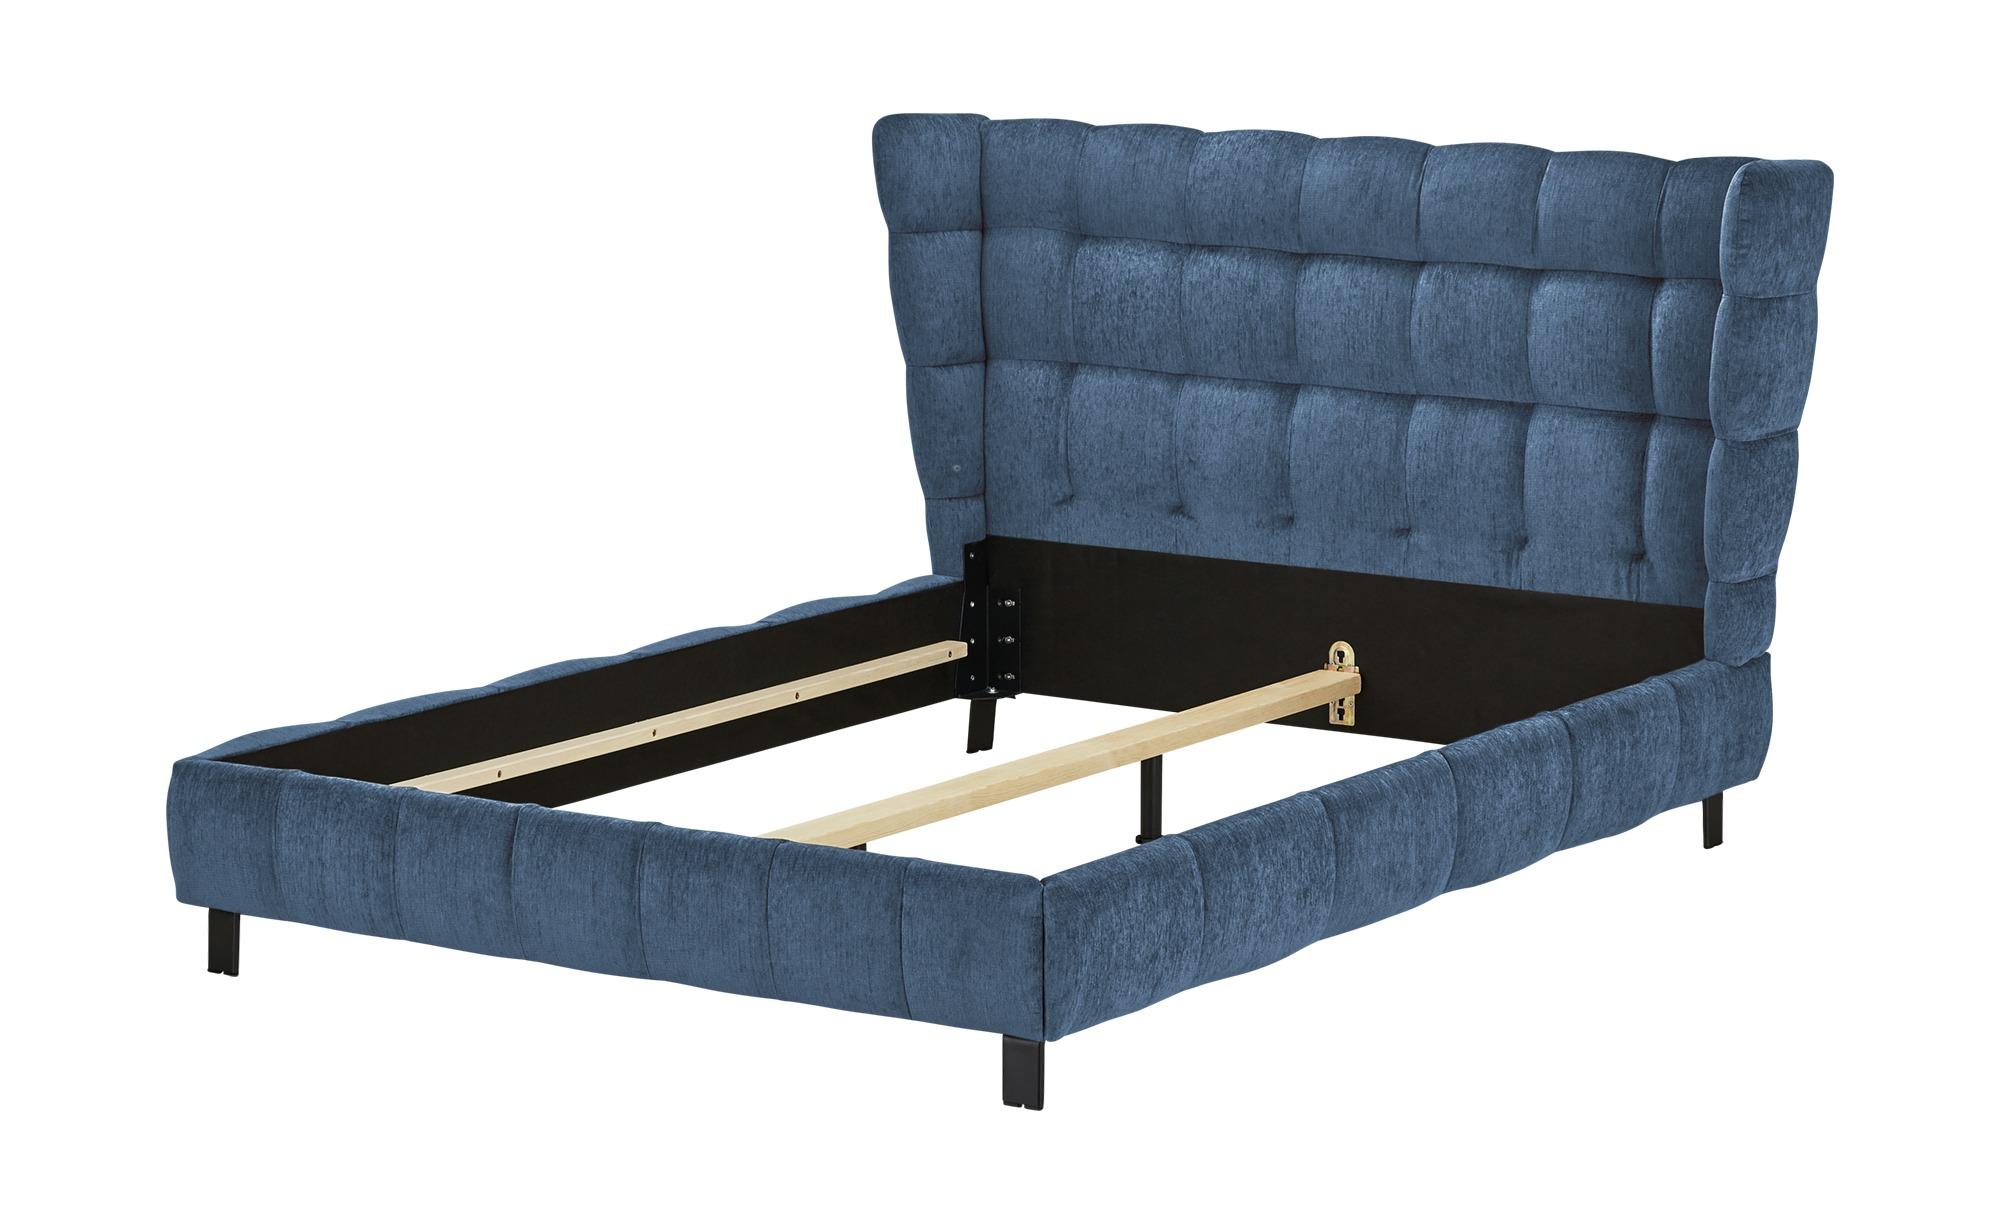 Polsterbettgestell 160x200 - blau Caterham ¦ blau ¦ Maße (cm): B: 188 H: 109 T: 214 Betten > Polsterbetten - Höffner